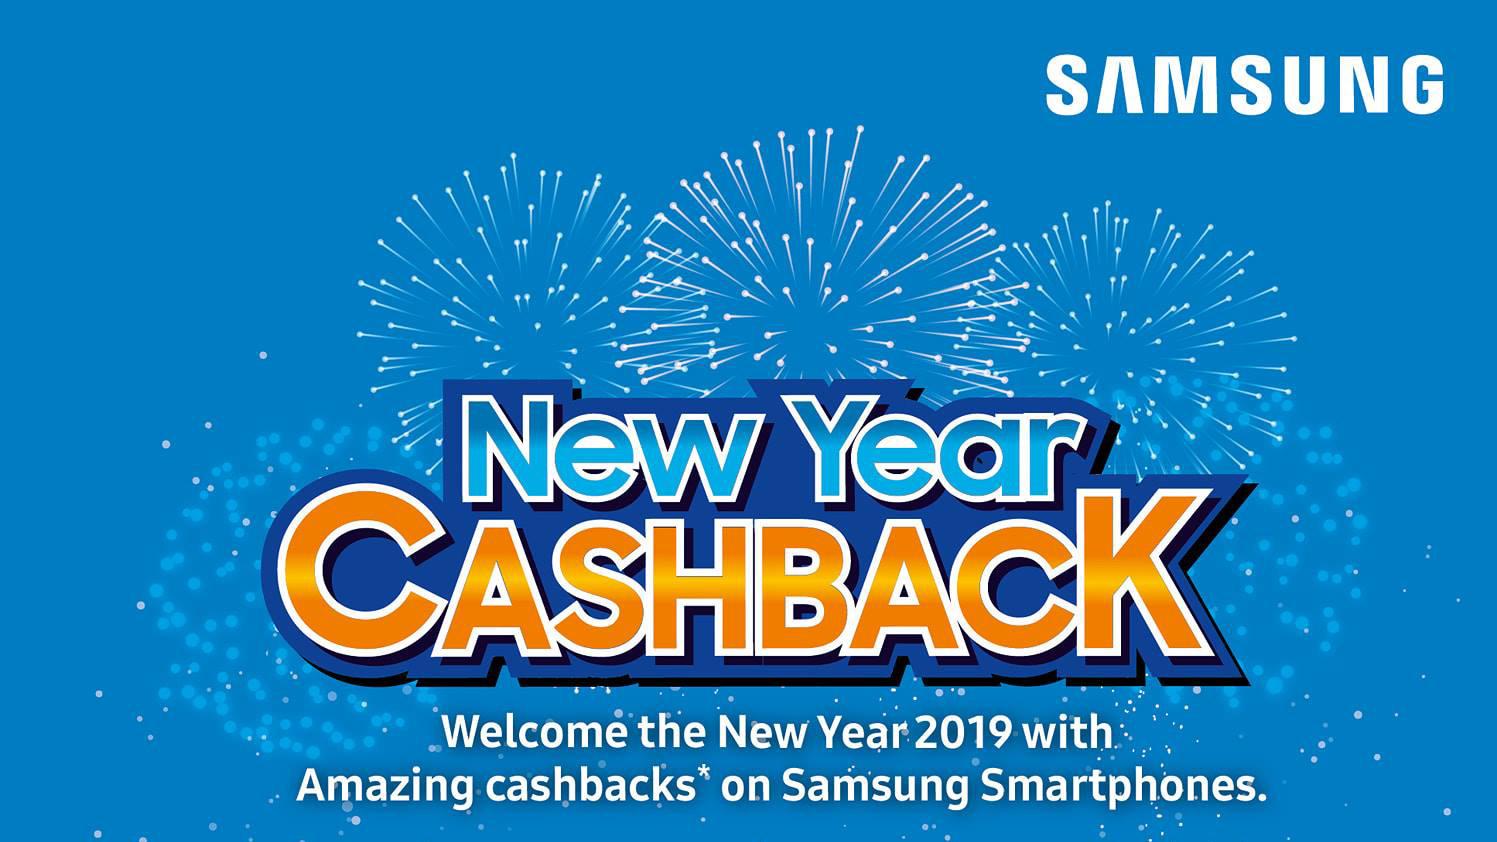 Samsung New Year Cash Back Offer